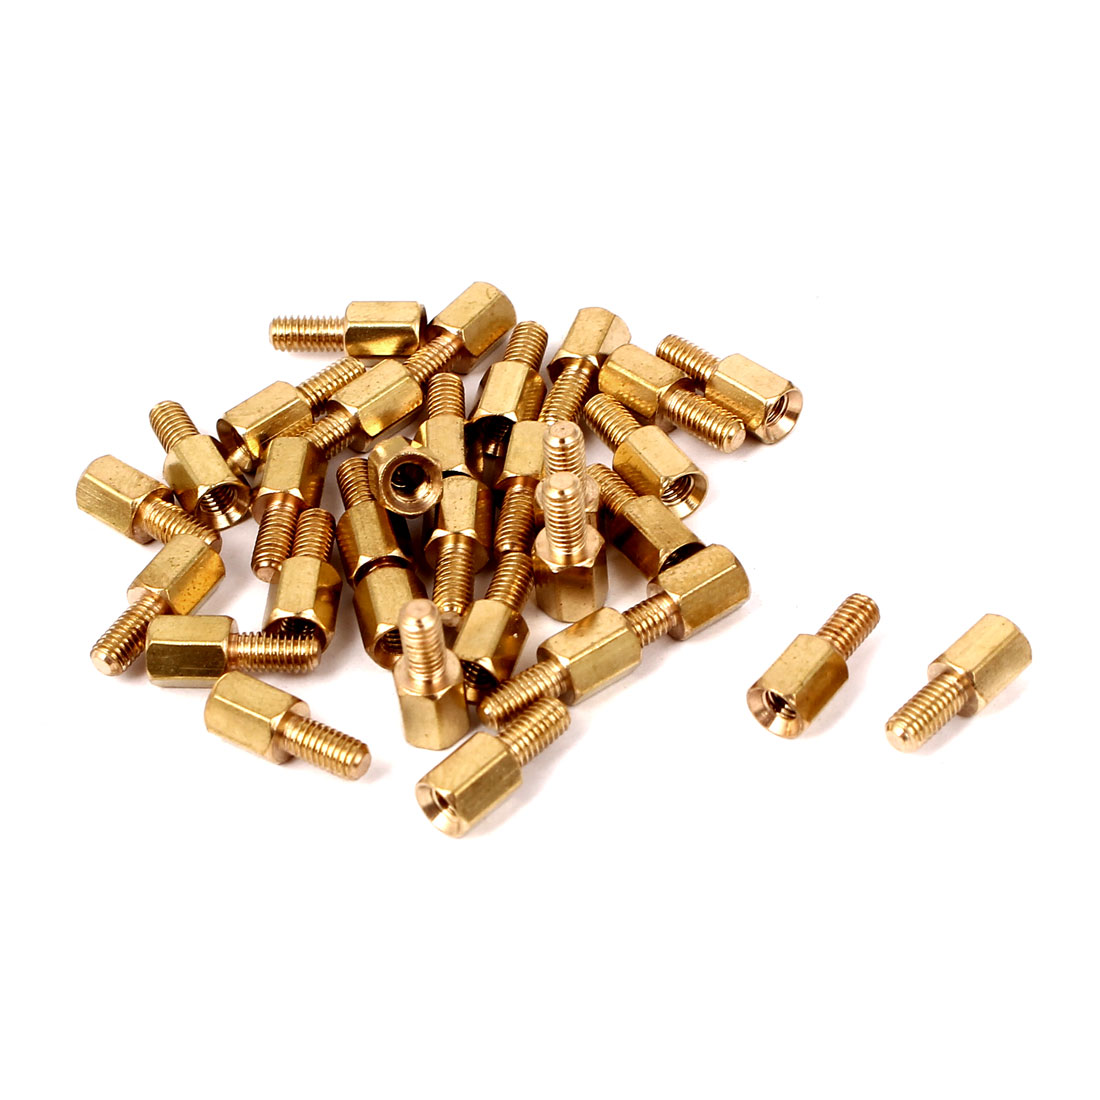 19mm x 1 Metric HSS Right hand Tap M19 x 1.0mm Pitch DORL/_A